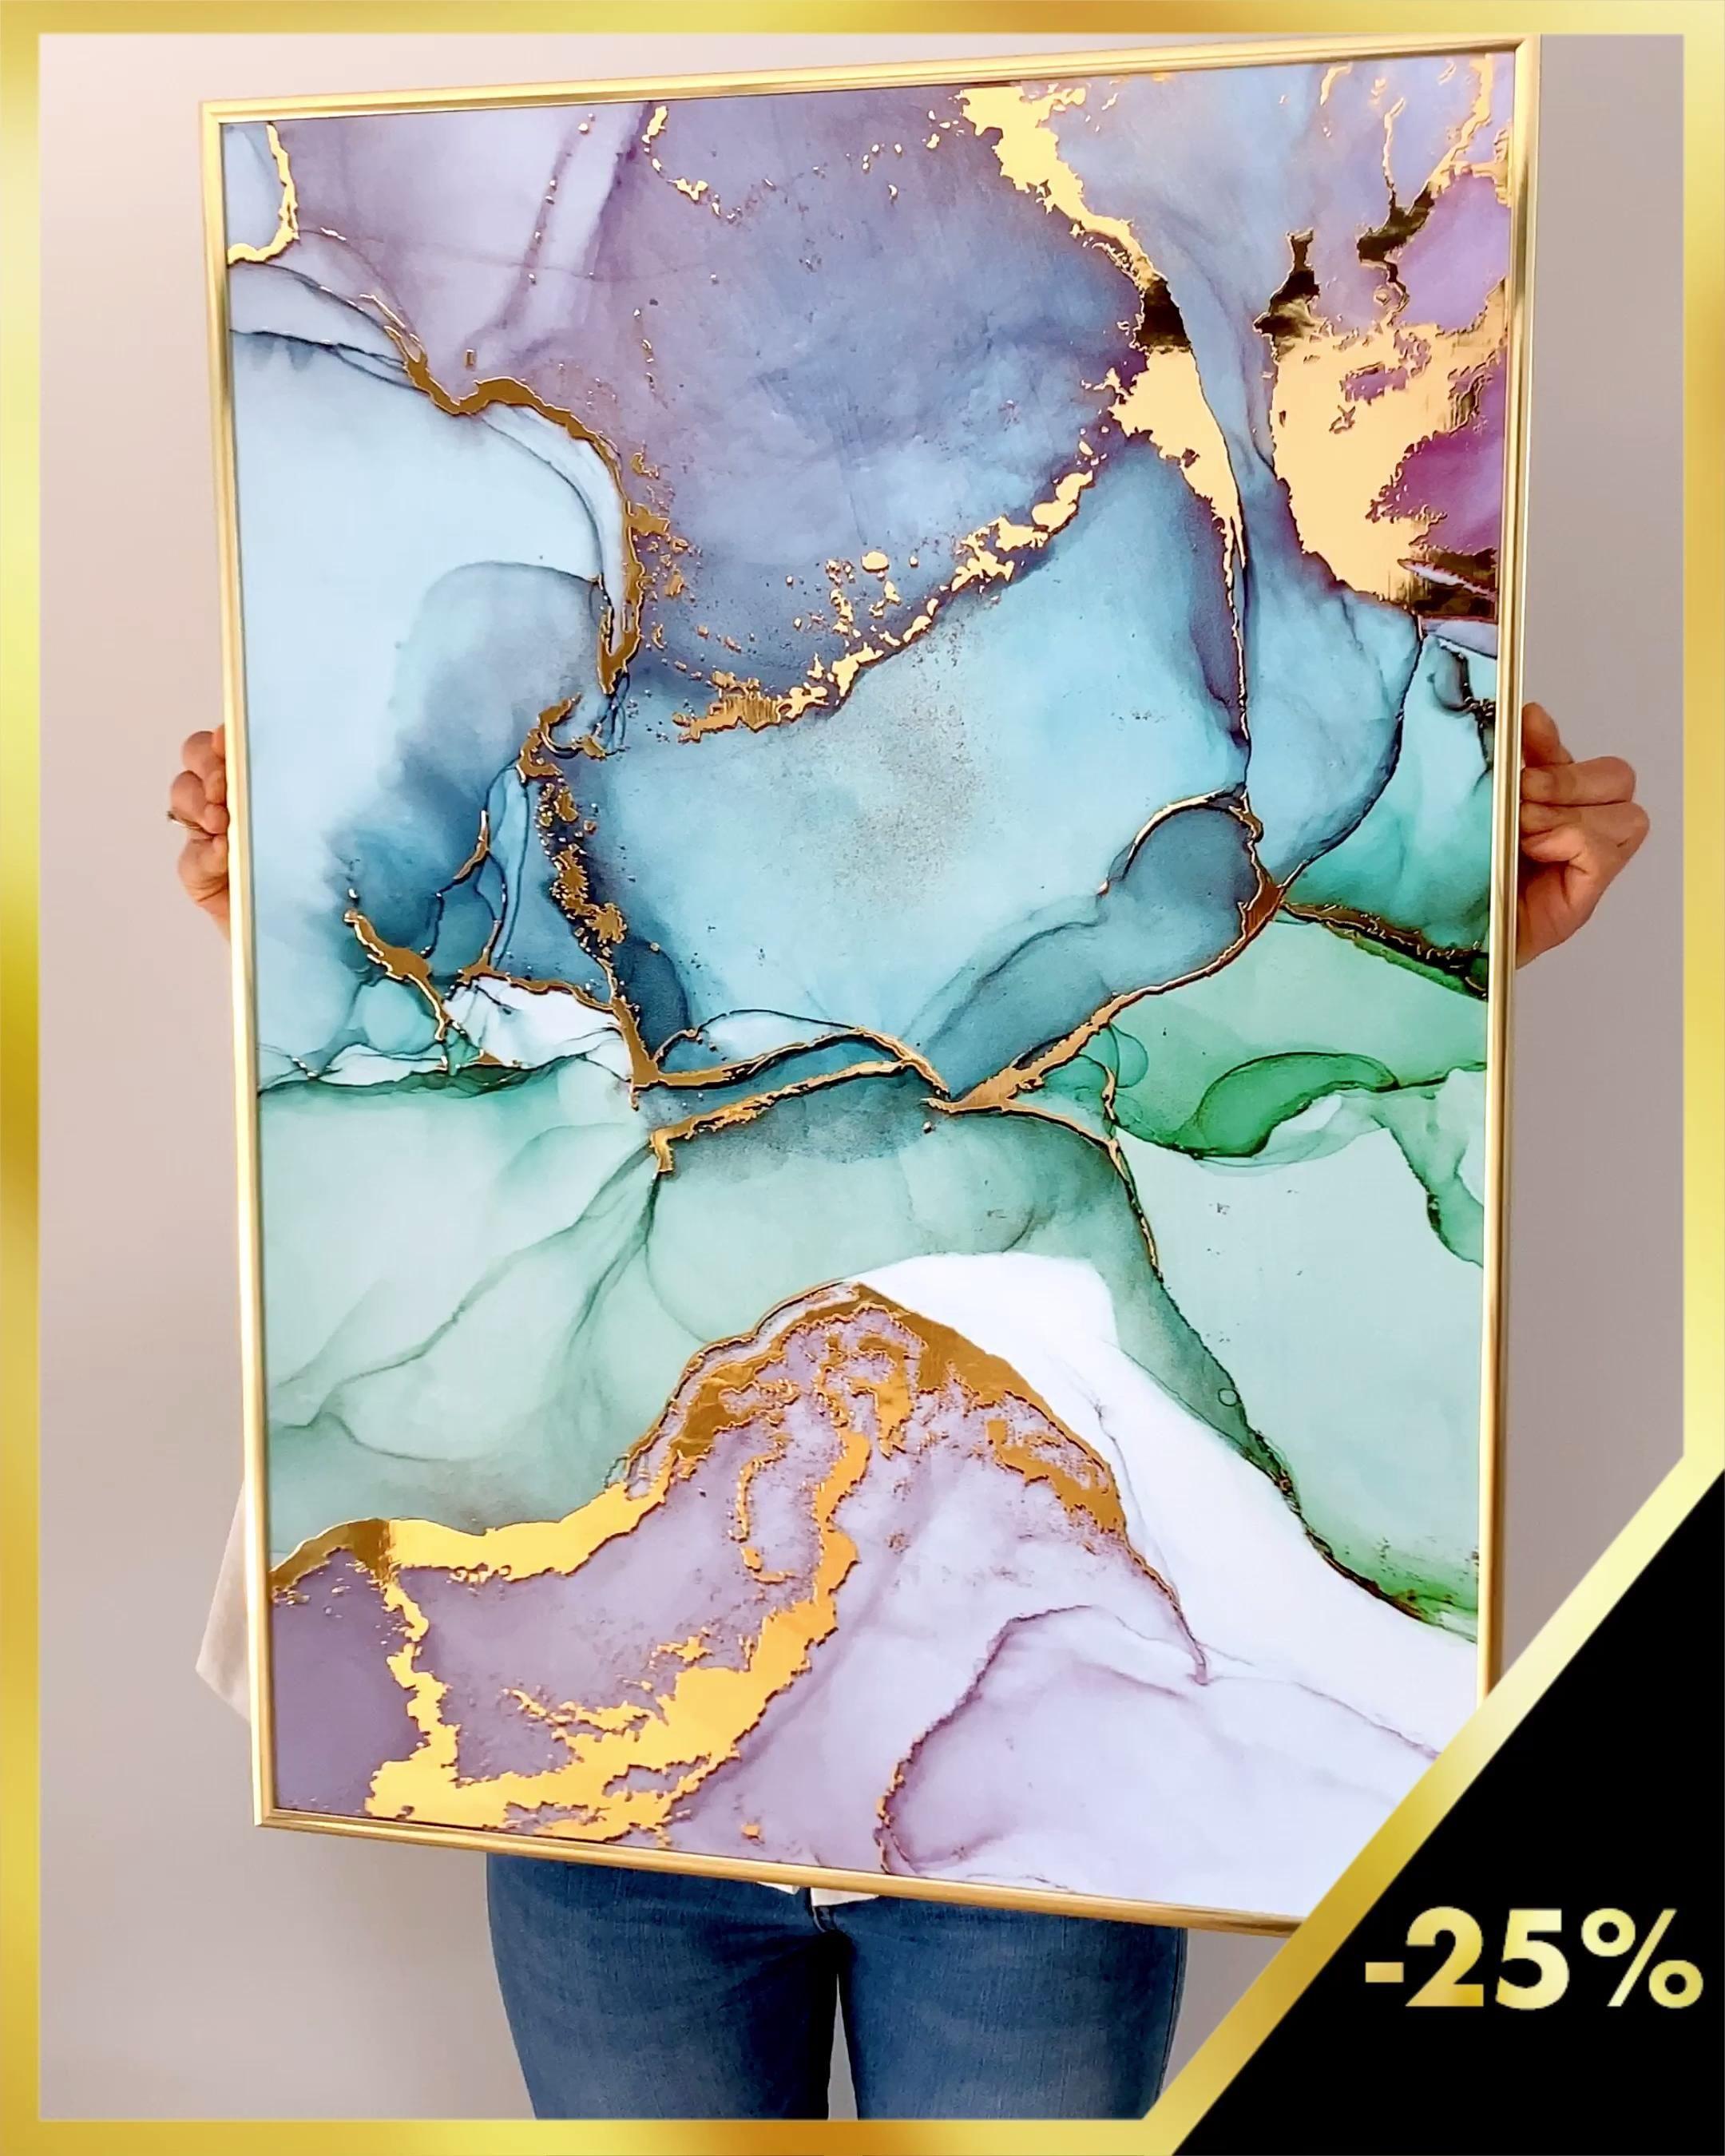 Aquarell Poster mit echtem Glanzeffekt - Heute -25